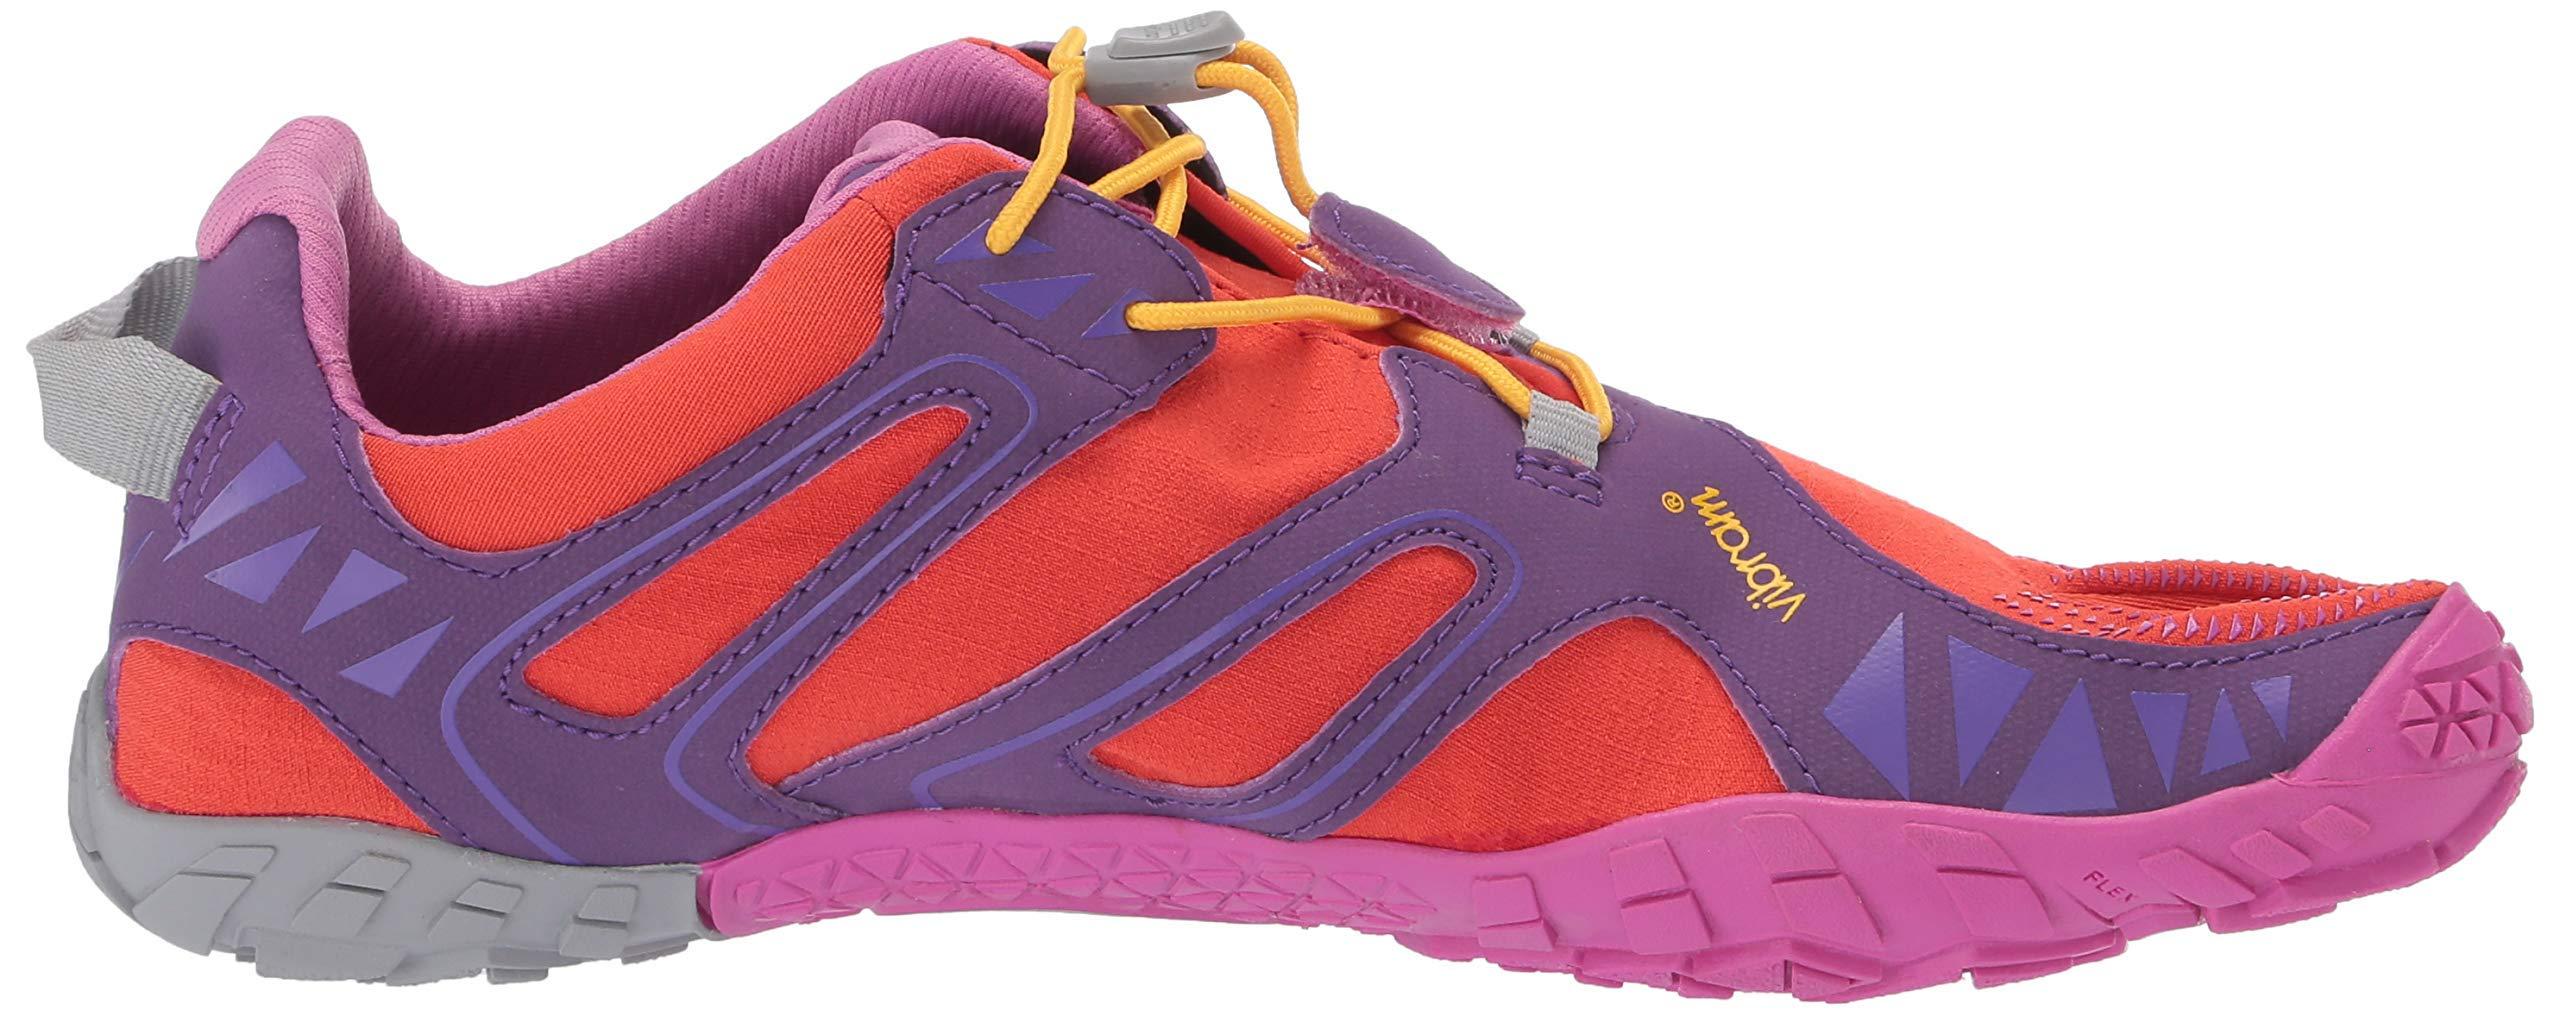 Vibram FiveFingers V-Trail, Women's Trail Running Shoes, Orange (Magenta/Orange), 7.5-8 UK (41 EU) by Vibram (Image #7)